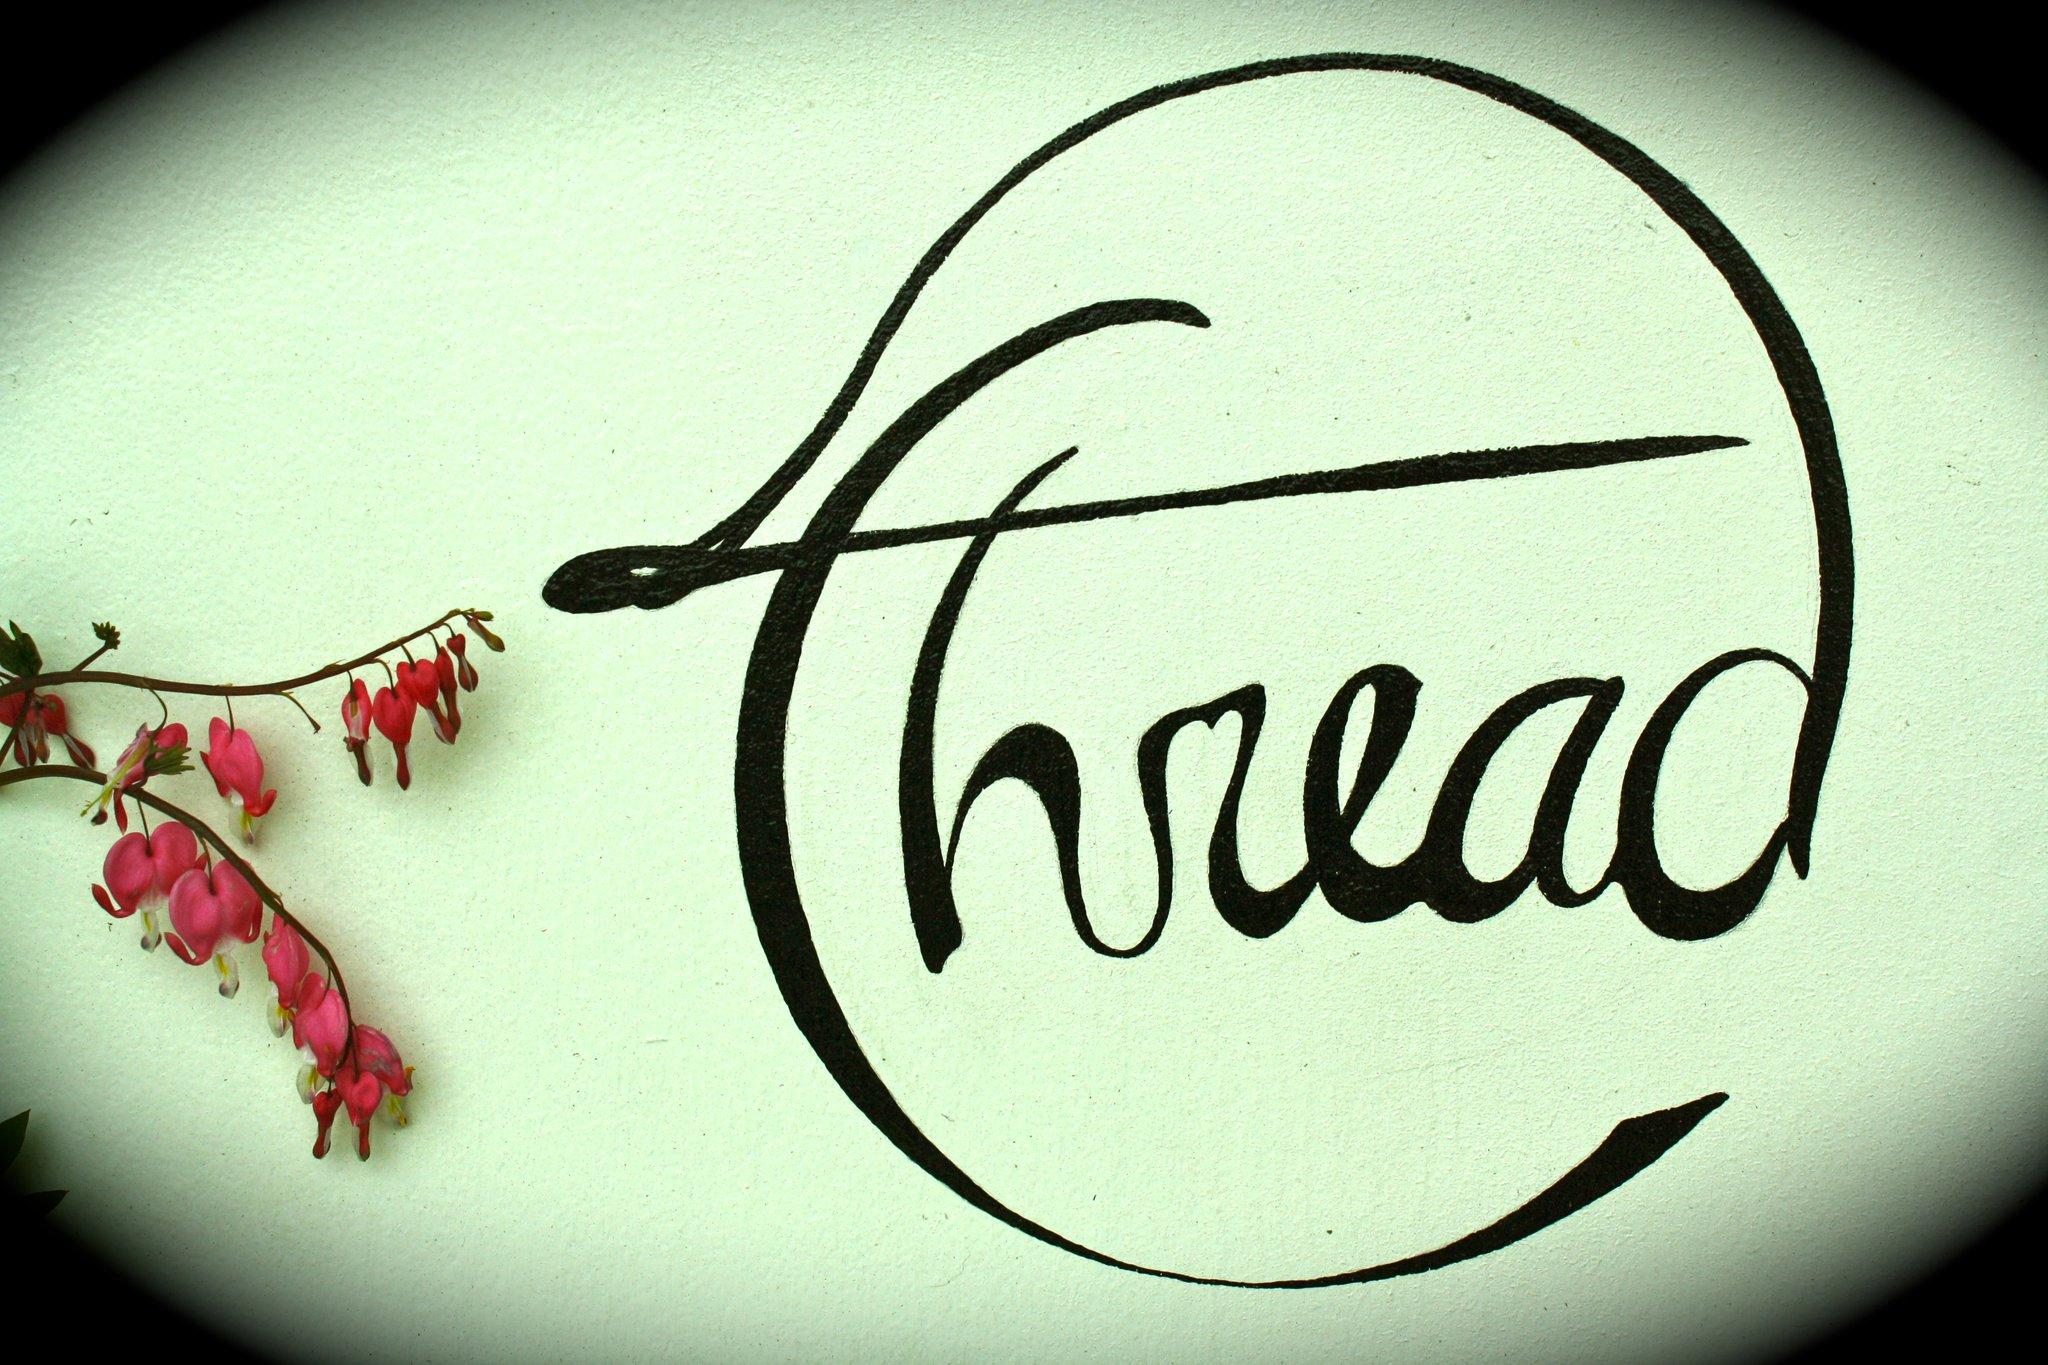 Thread Handmade.jpg